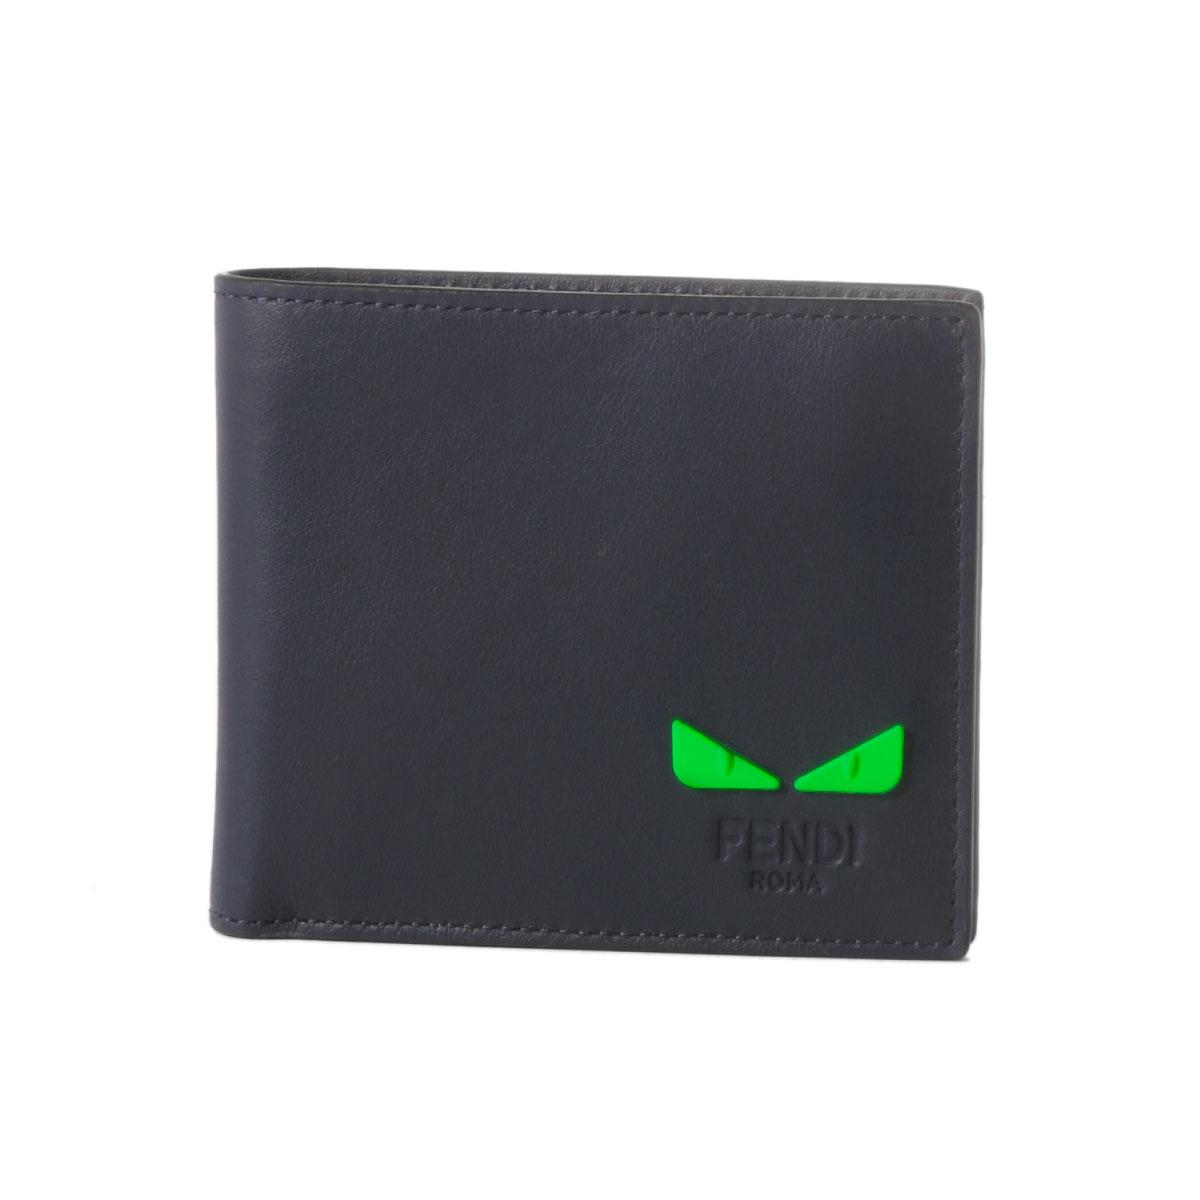 54afb7e4 Fendi FENDI wallet men 7M0266 A7TE F17H5 folio wallet BL.BERRY+VERDE FLU+P  dark blue